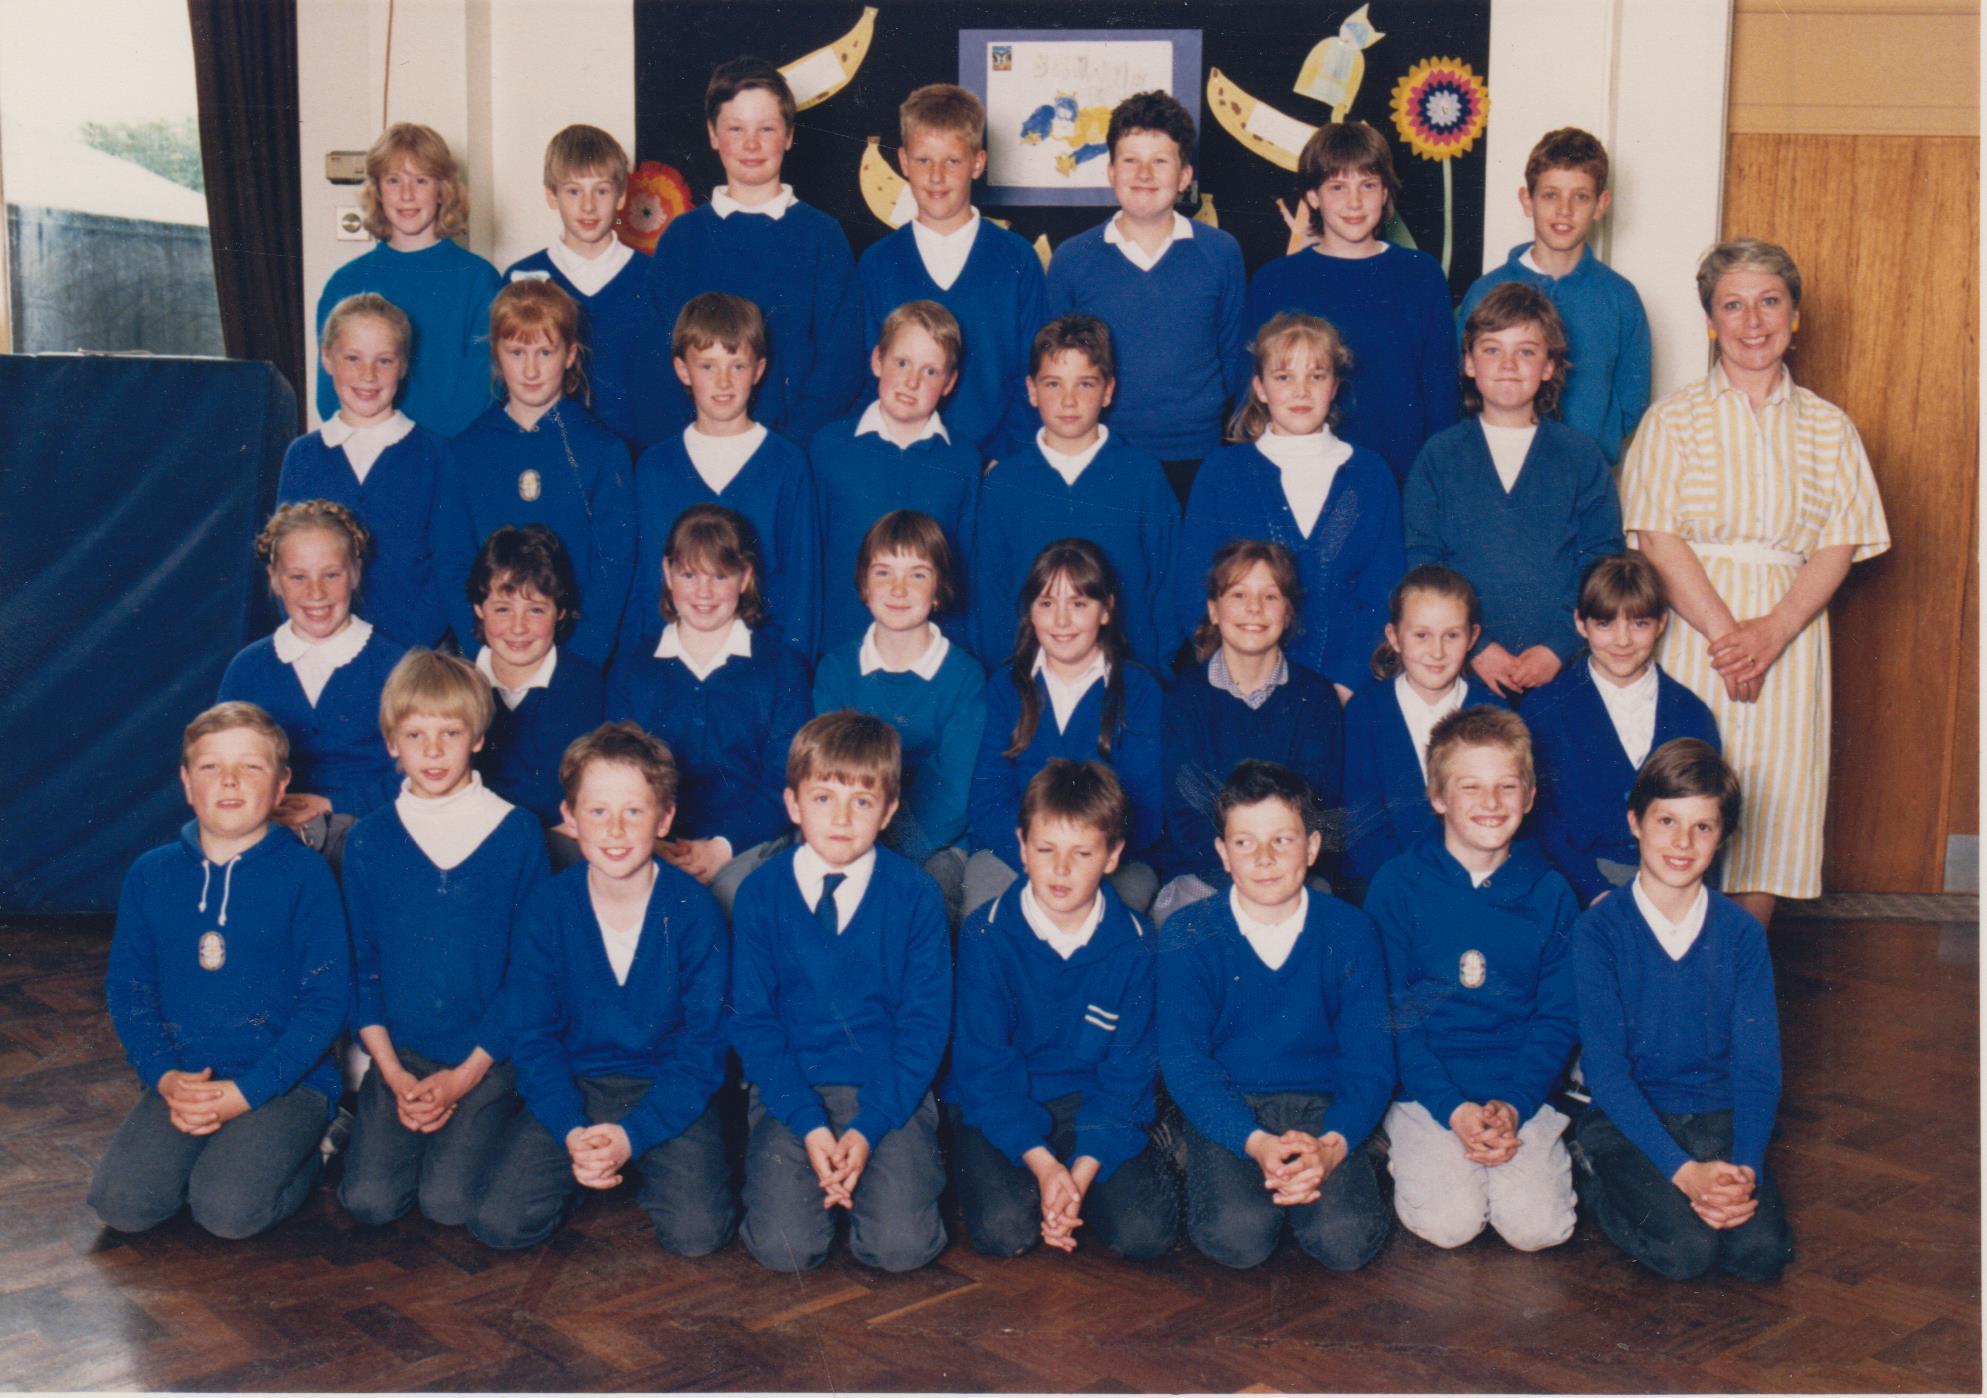 school_group_pycroft_front_right_001.jpg